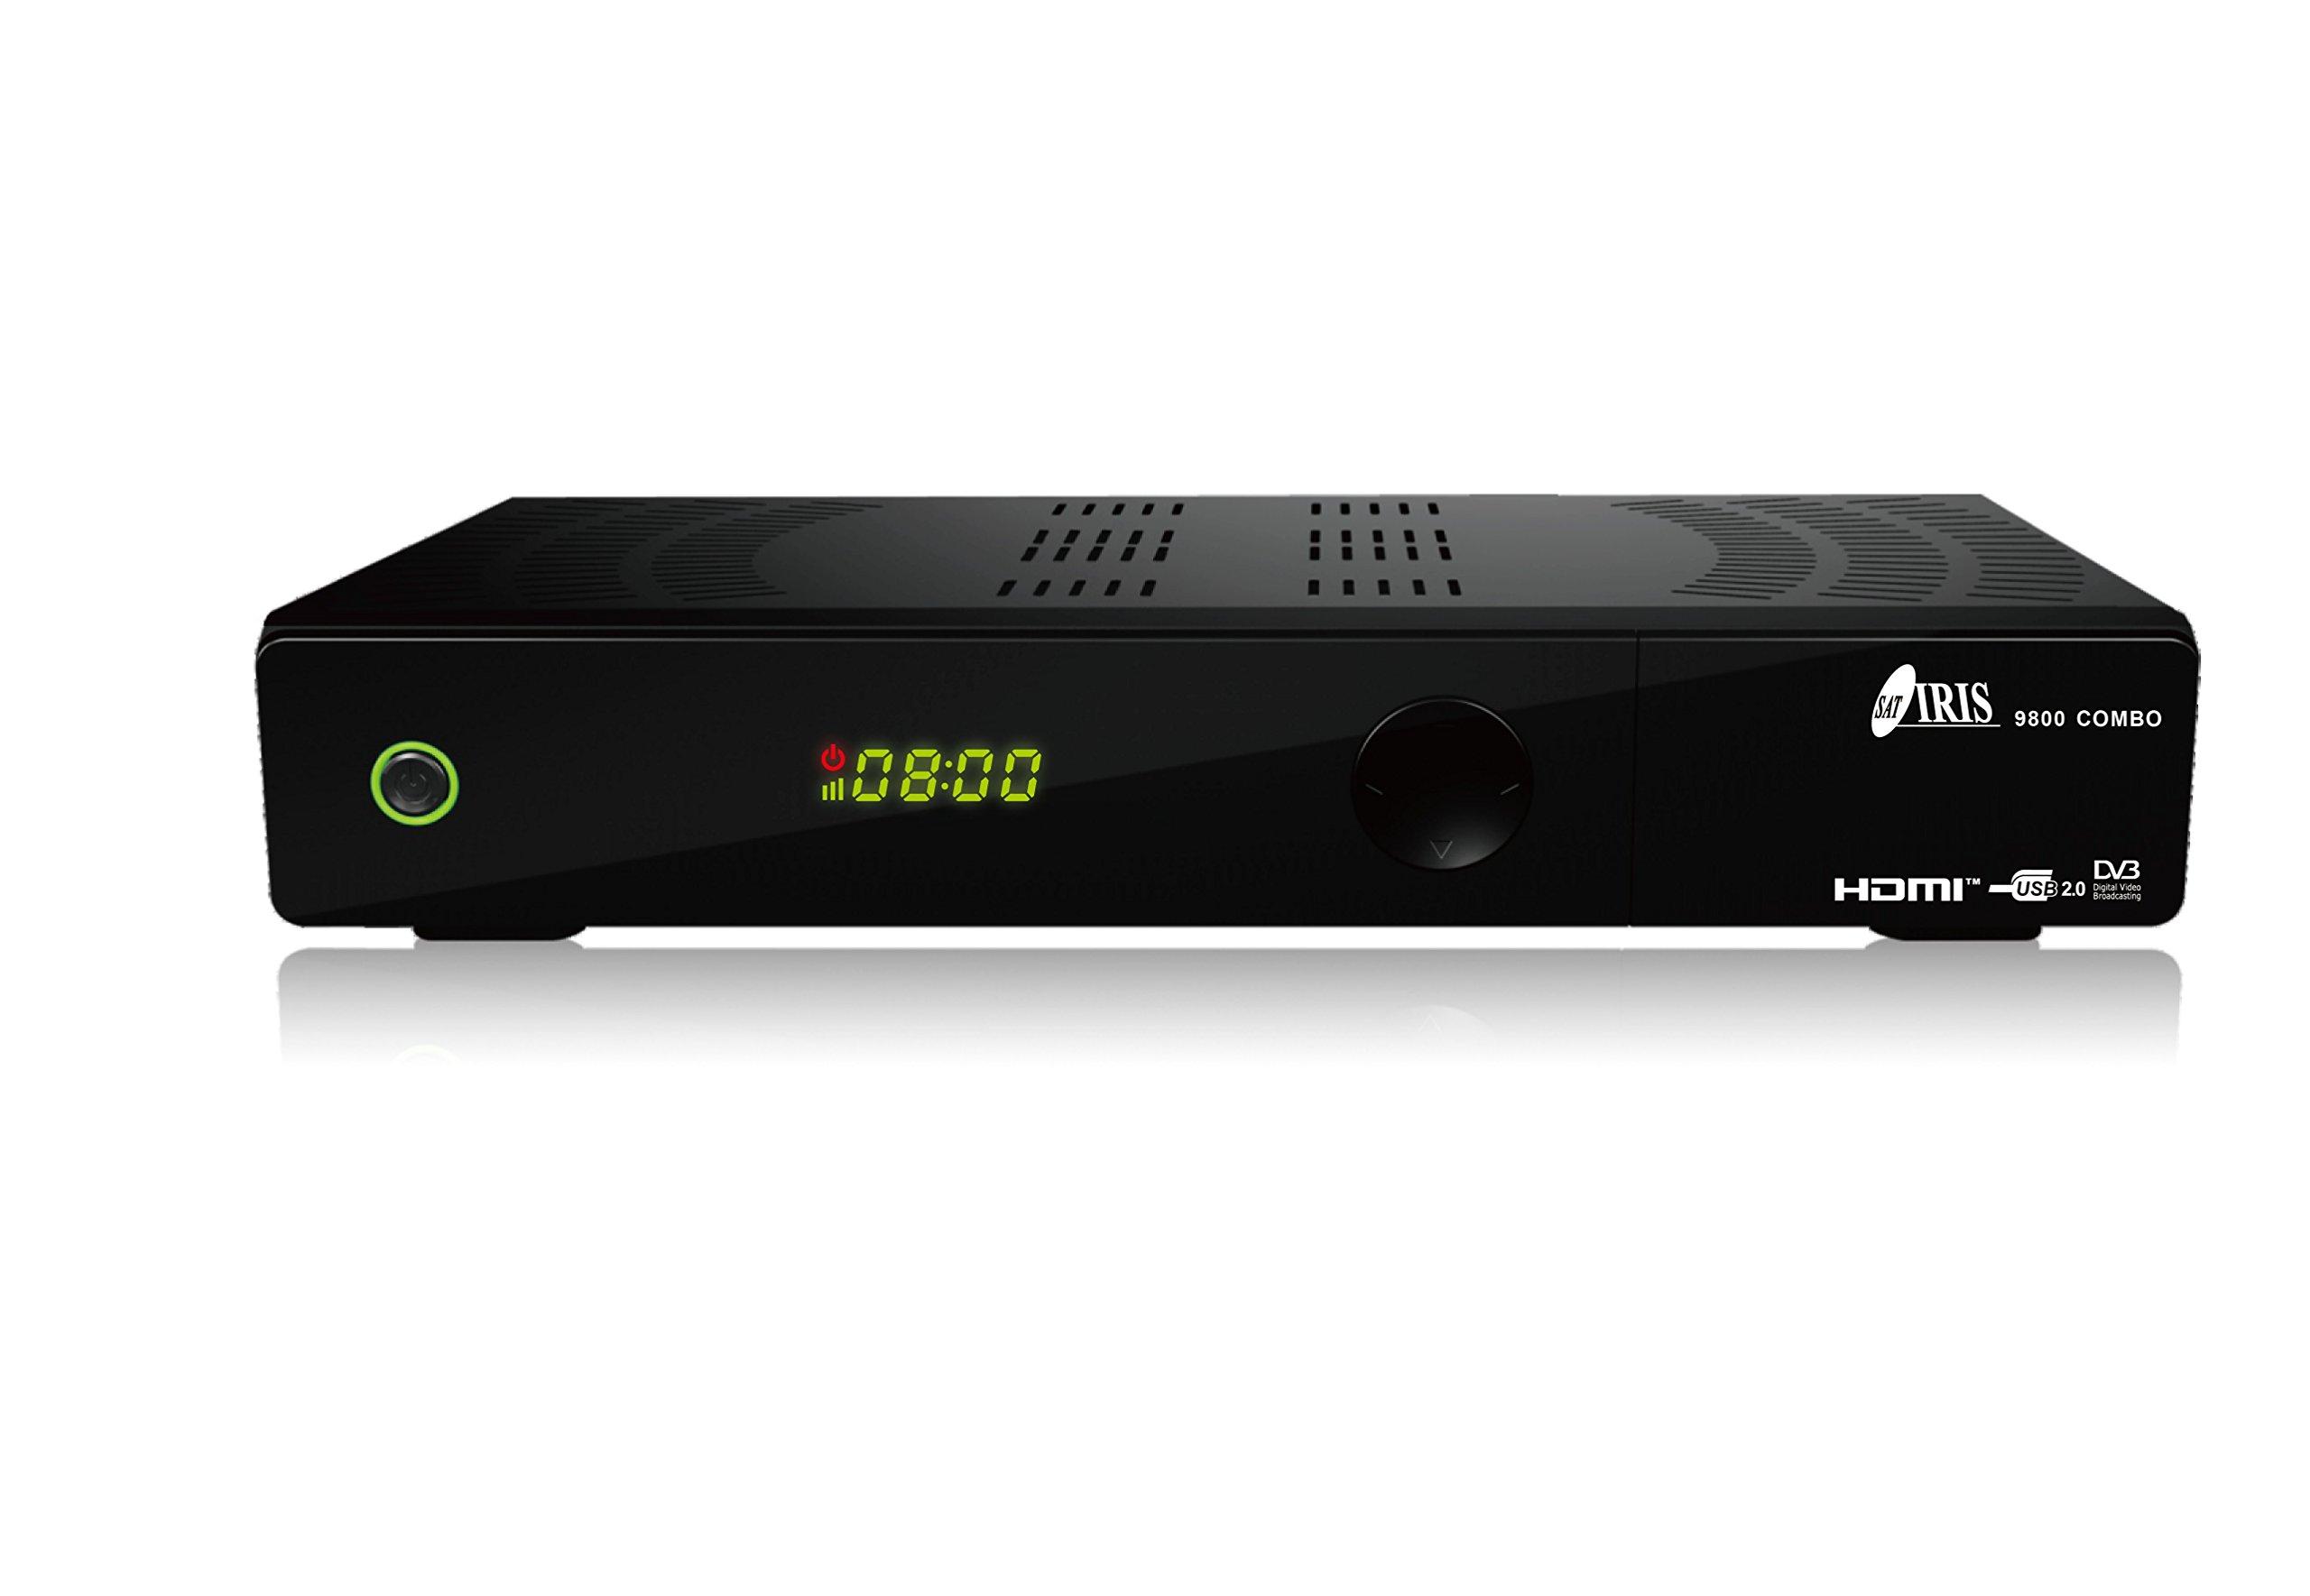 IRIS 9800 Combo product image